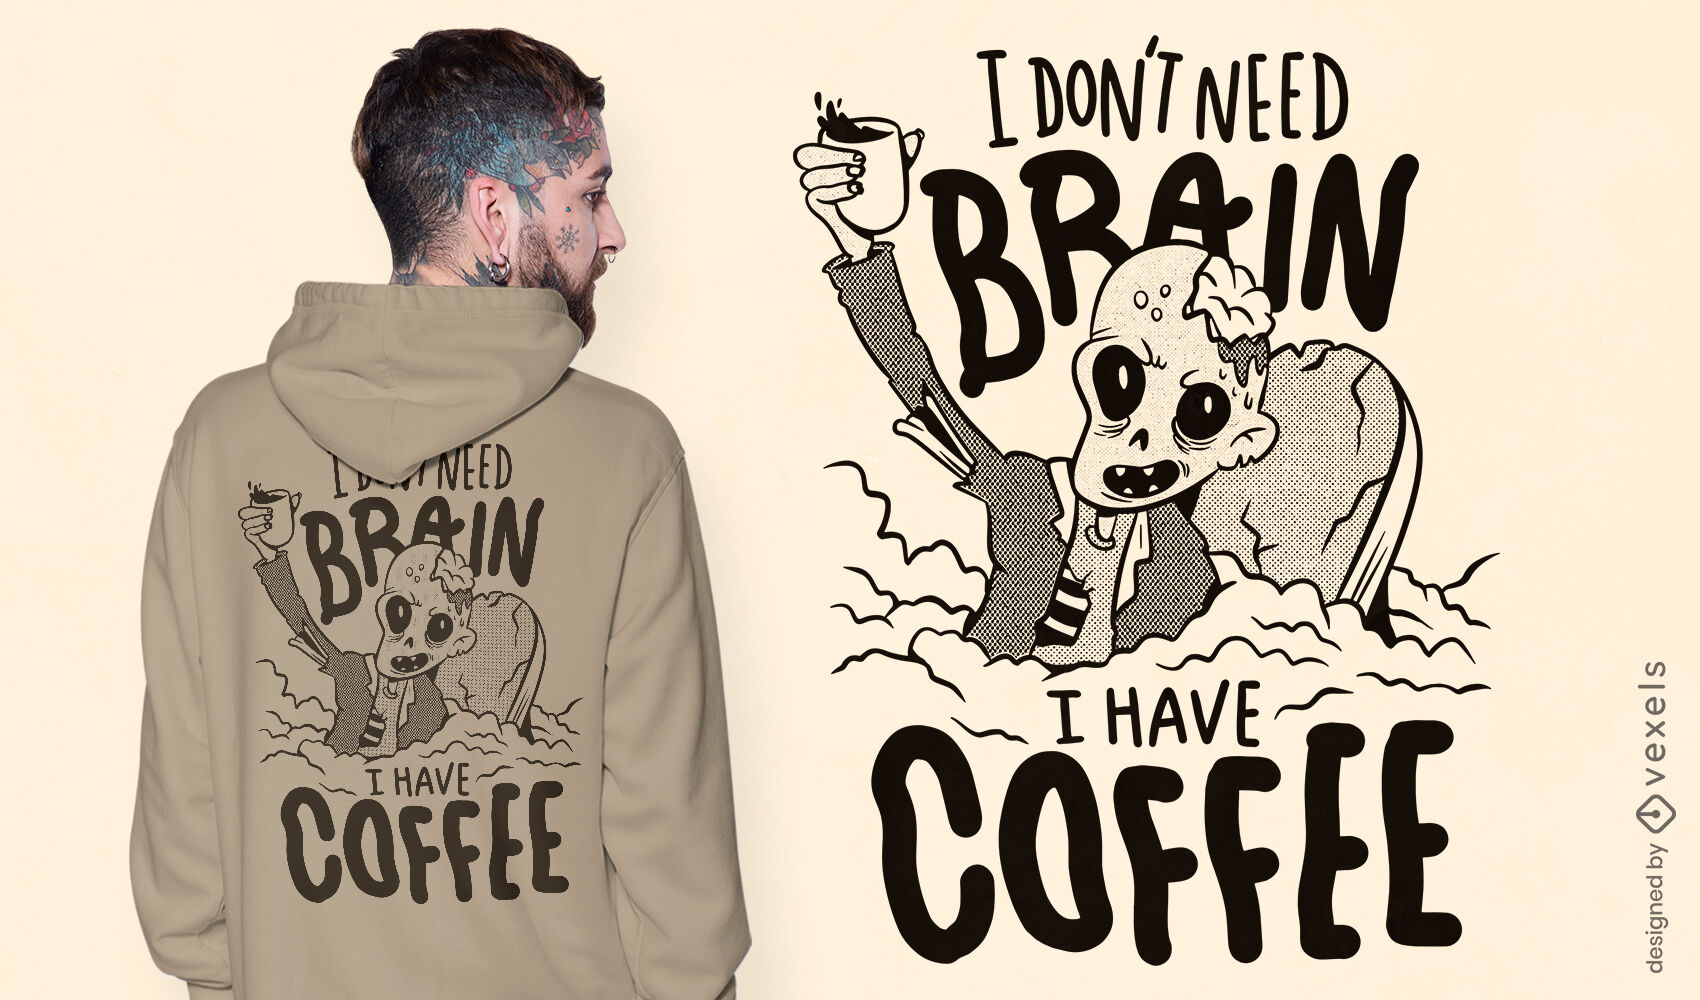 Brainless zombie on coffee t-shirt design